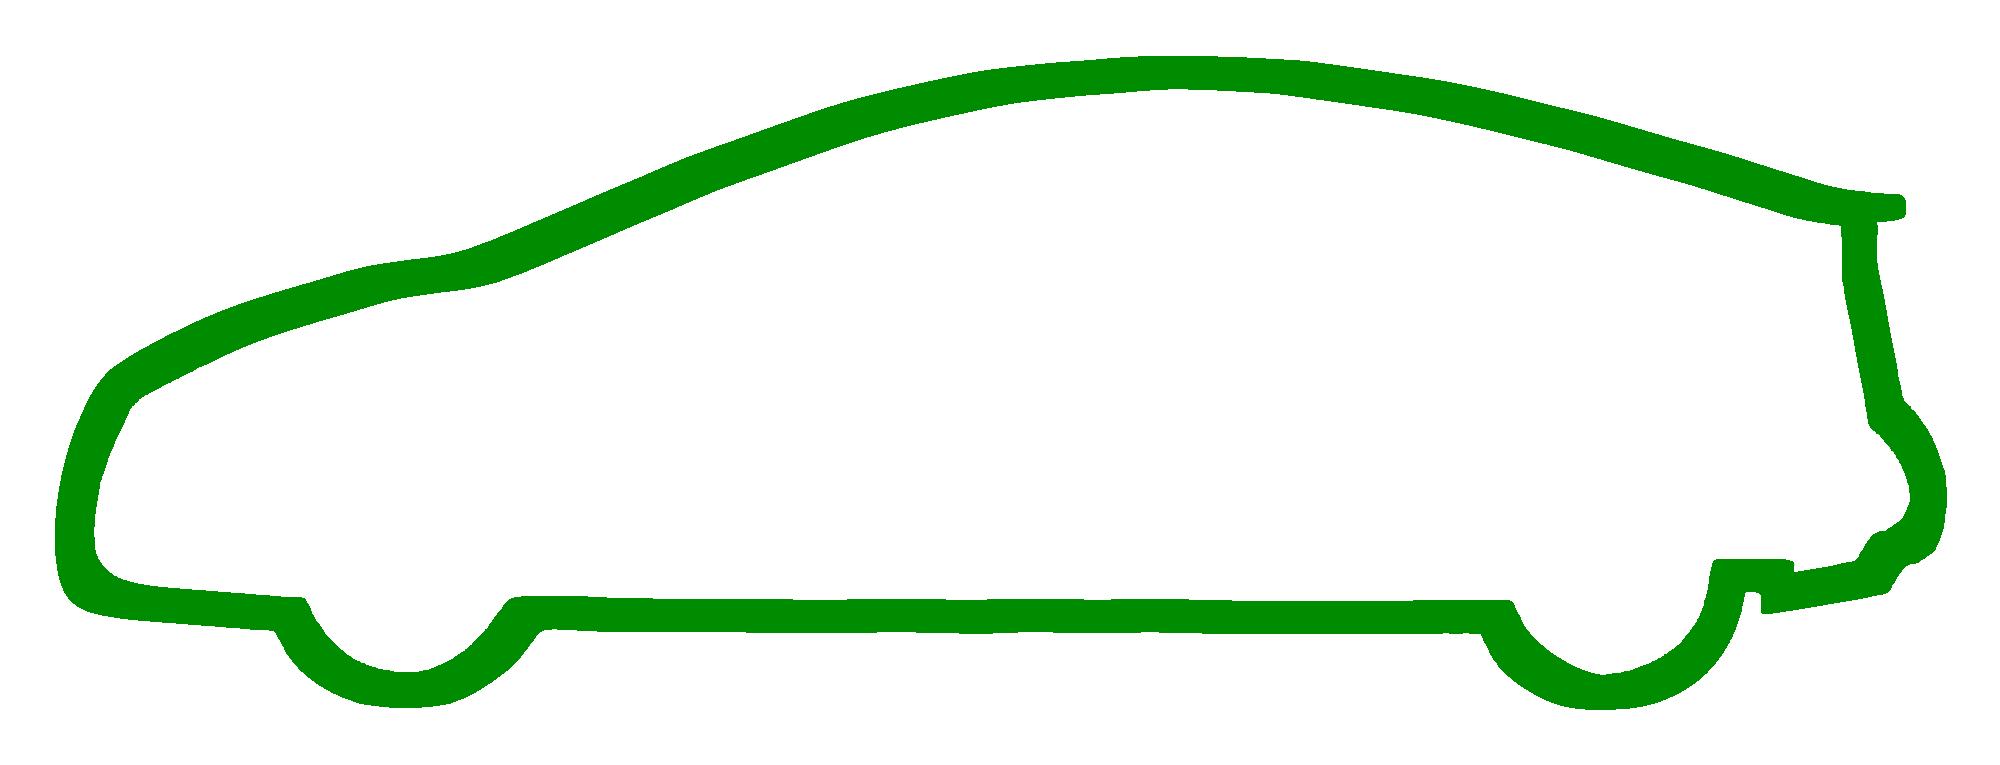 Cool car outline logo 2